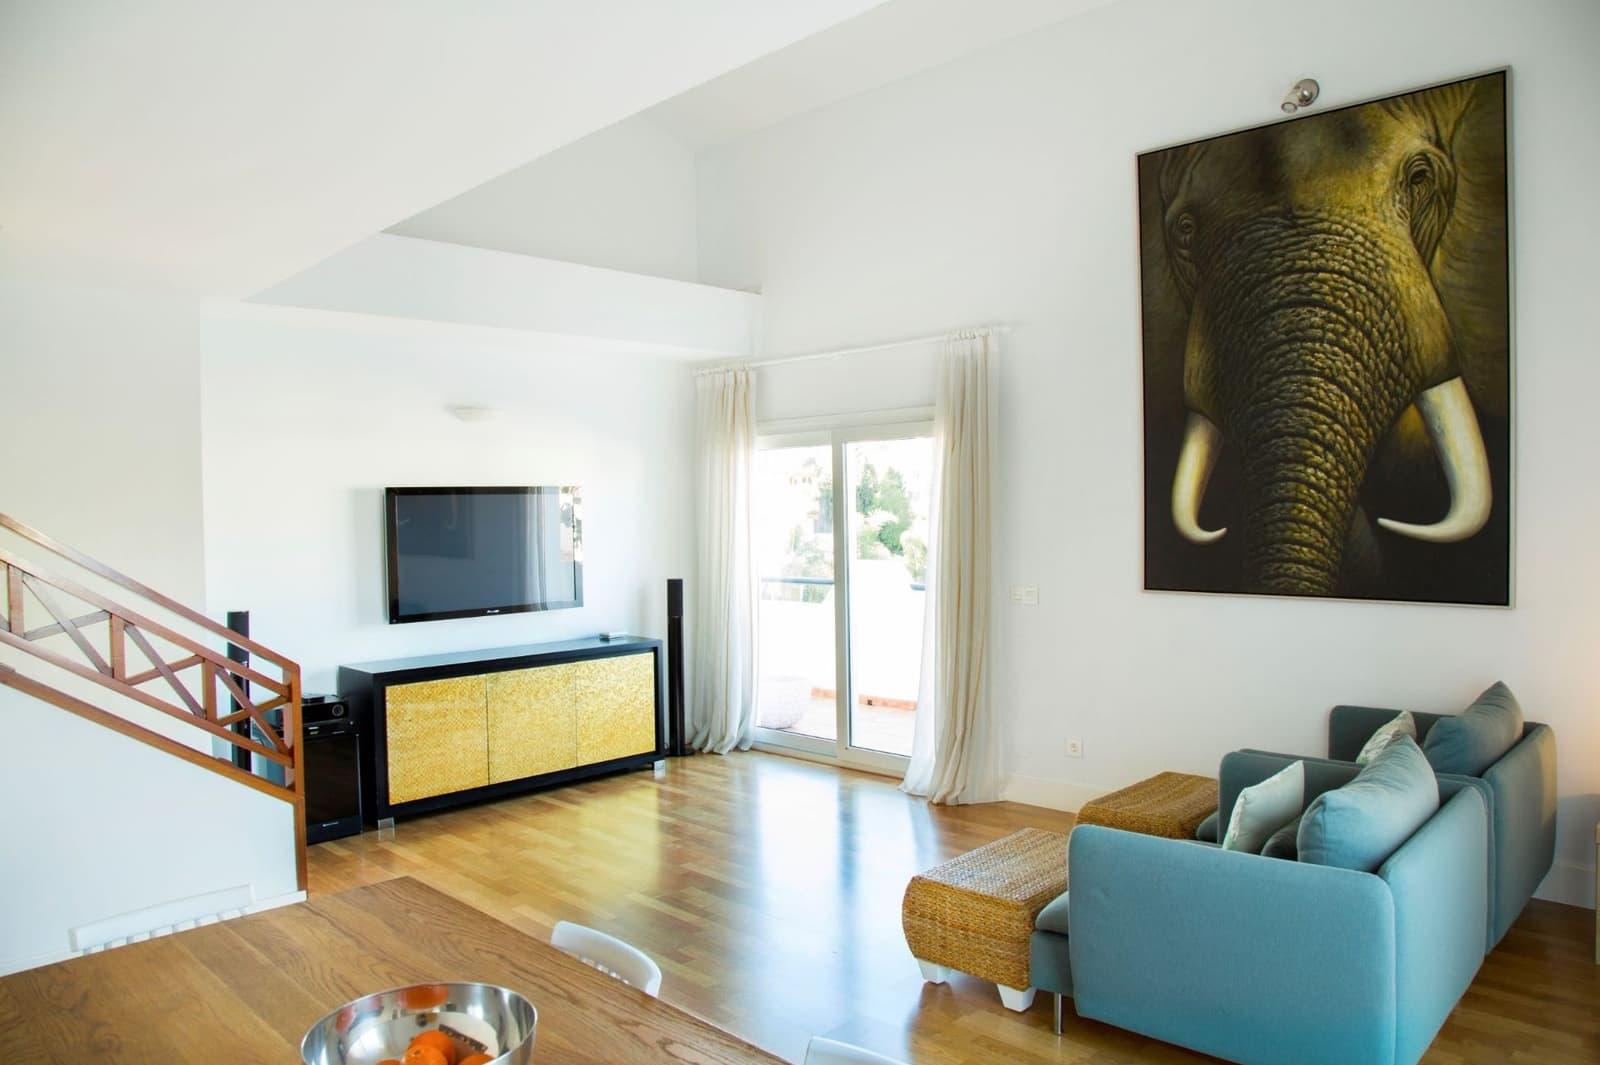 3 bedroom Penthouse for sale in Torremolinos with pool garage - € 560,000 (Ref: 4482906)